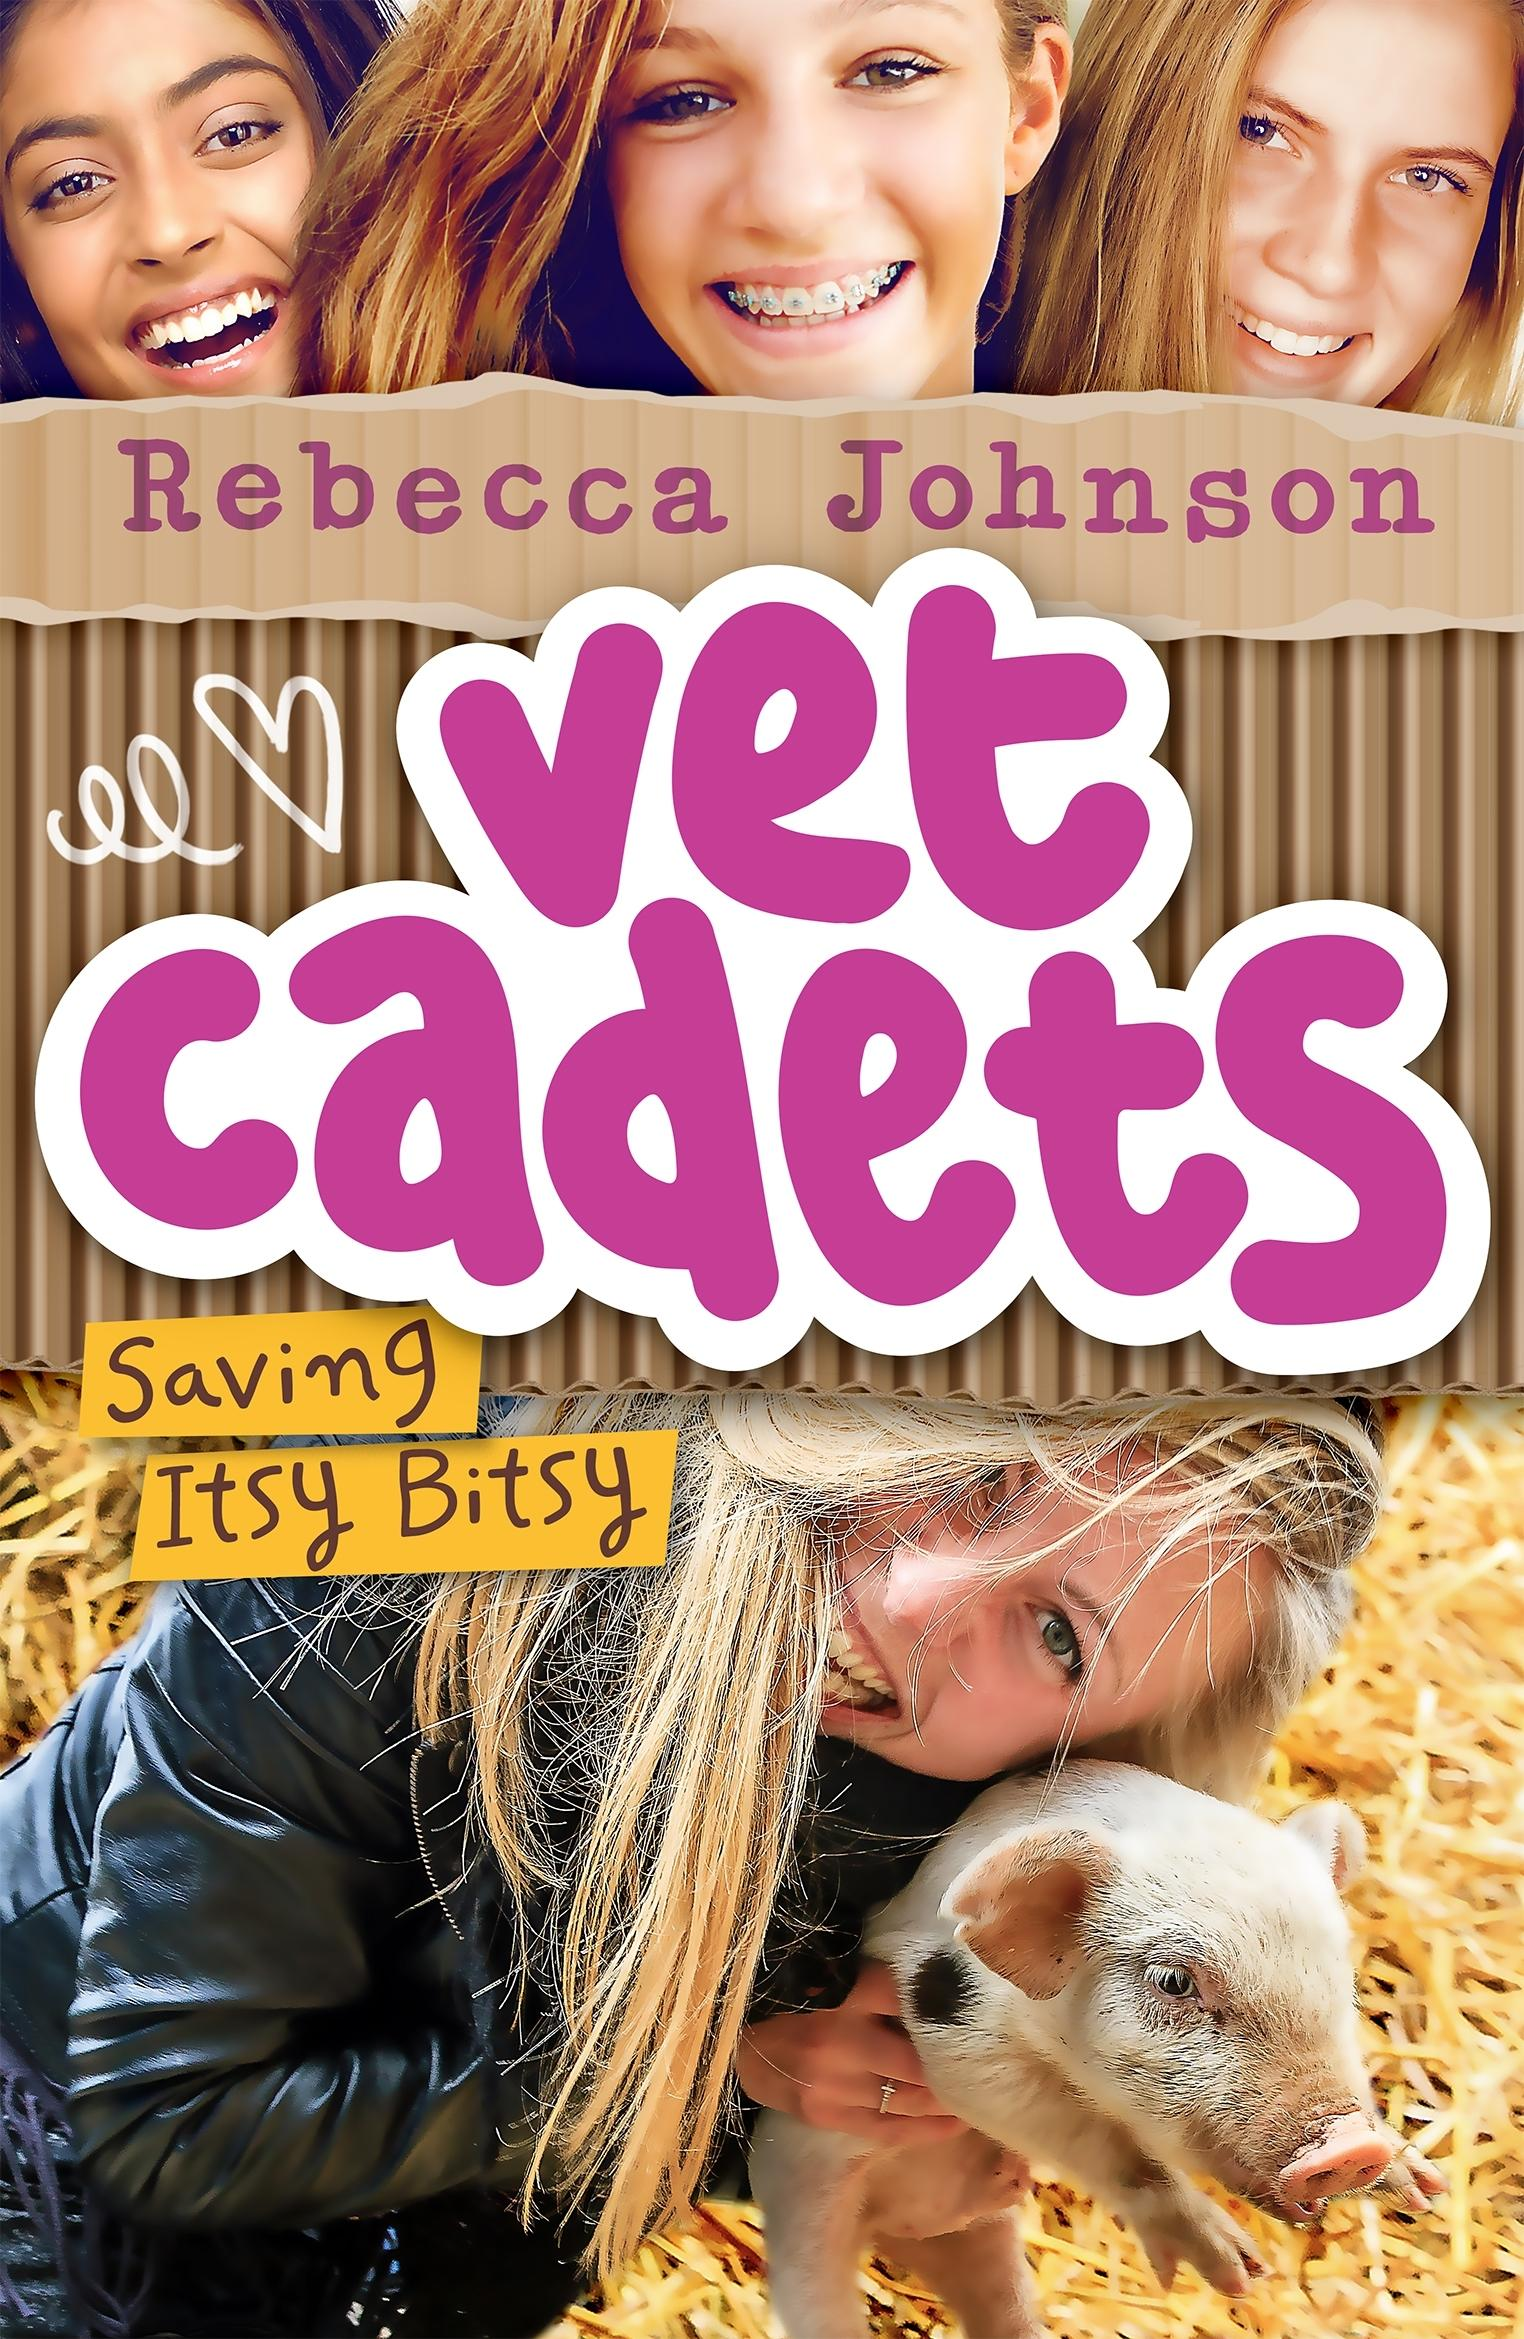 Vet Cadets: Saving Itsy Bitsy (book 3)